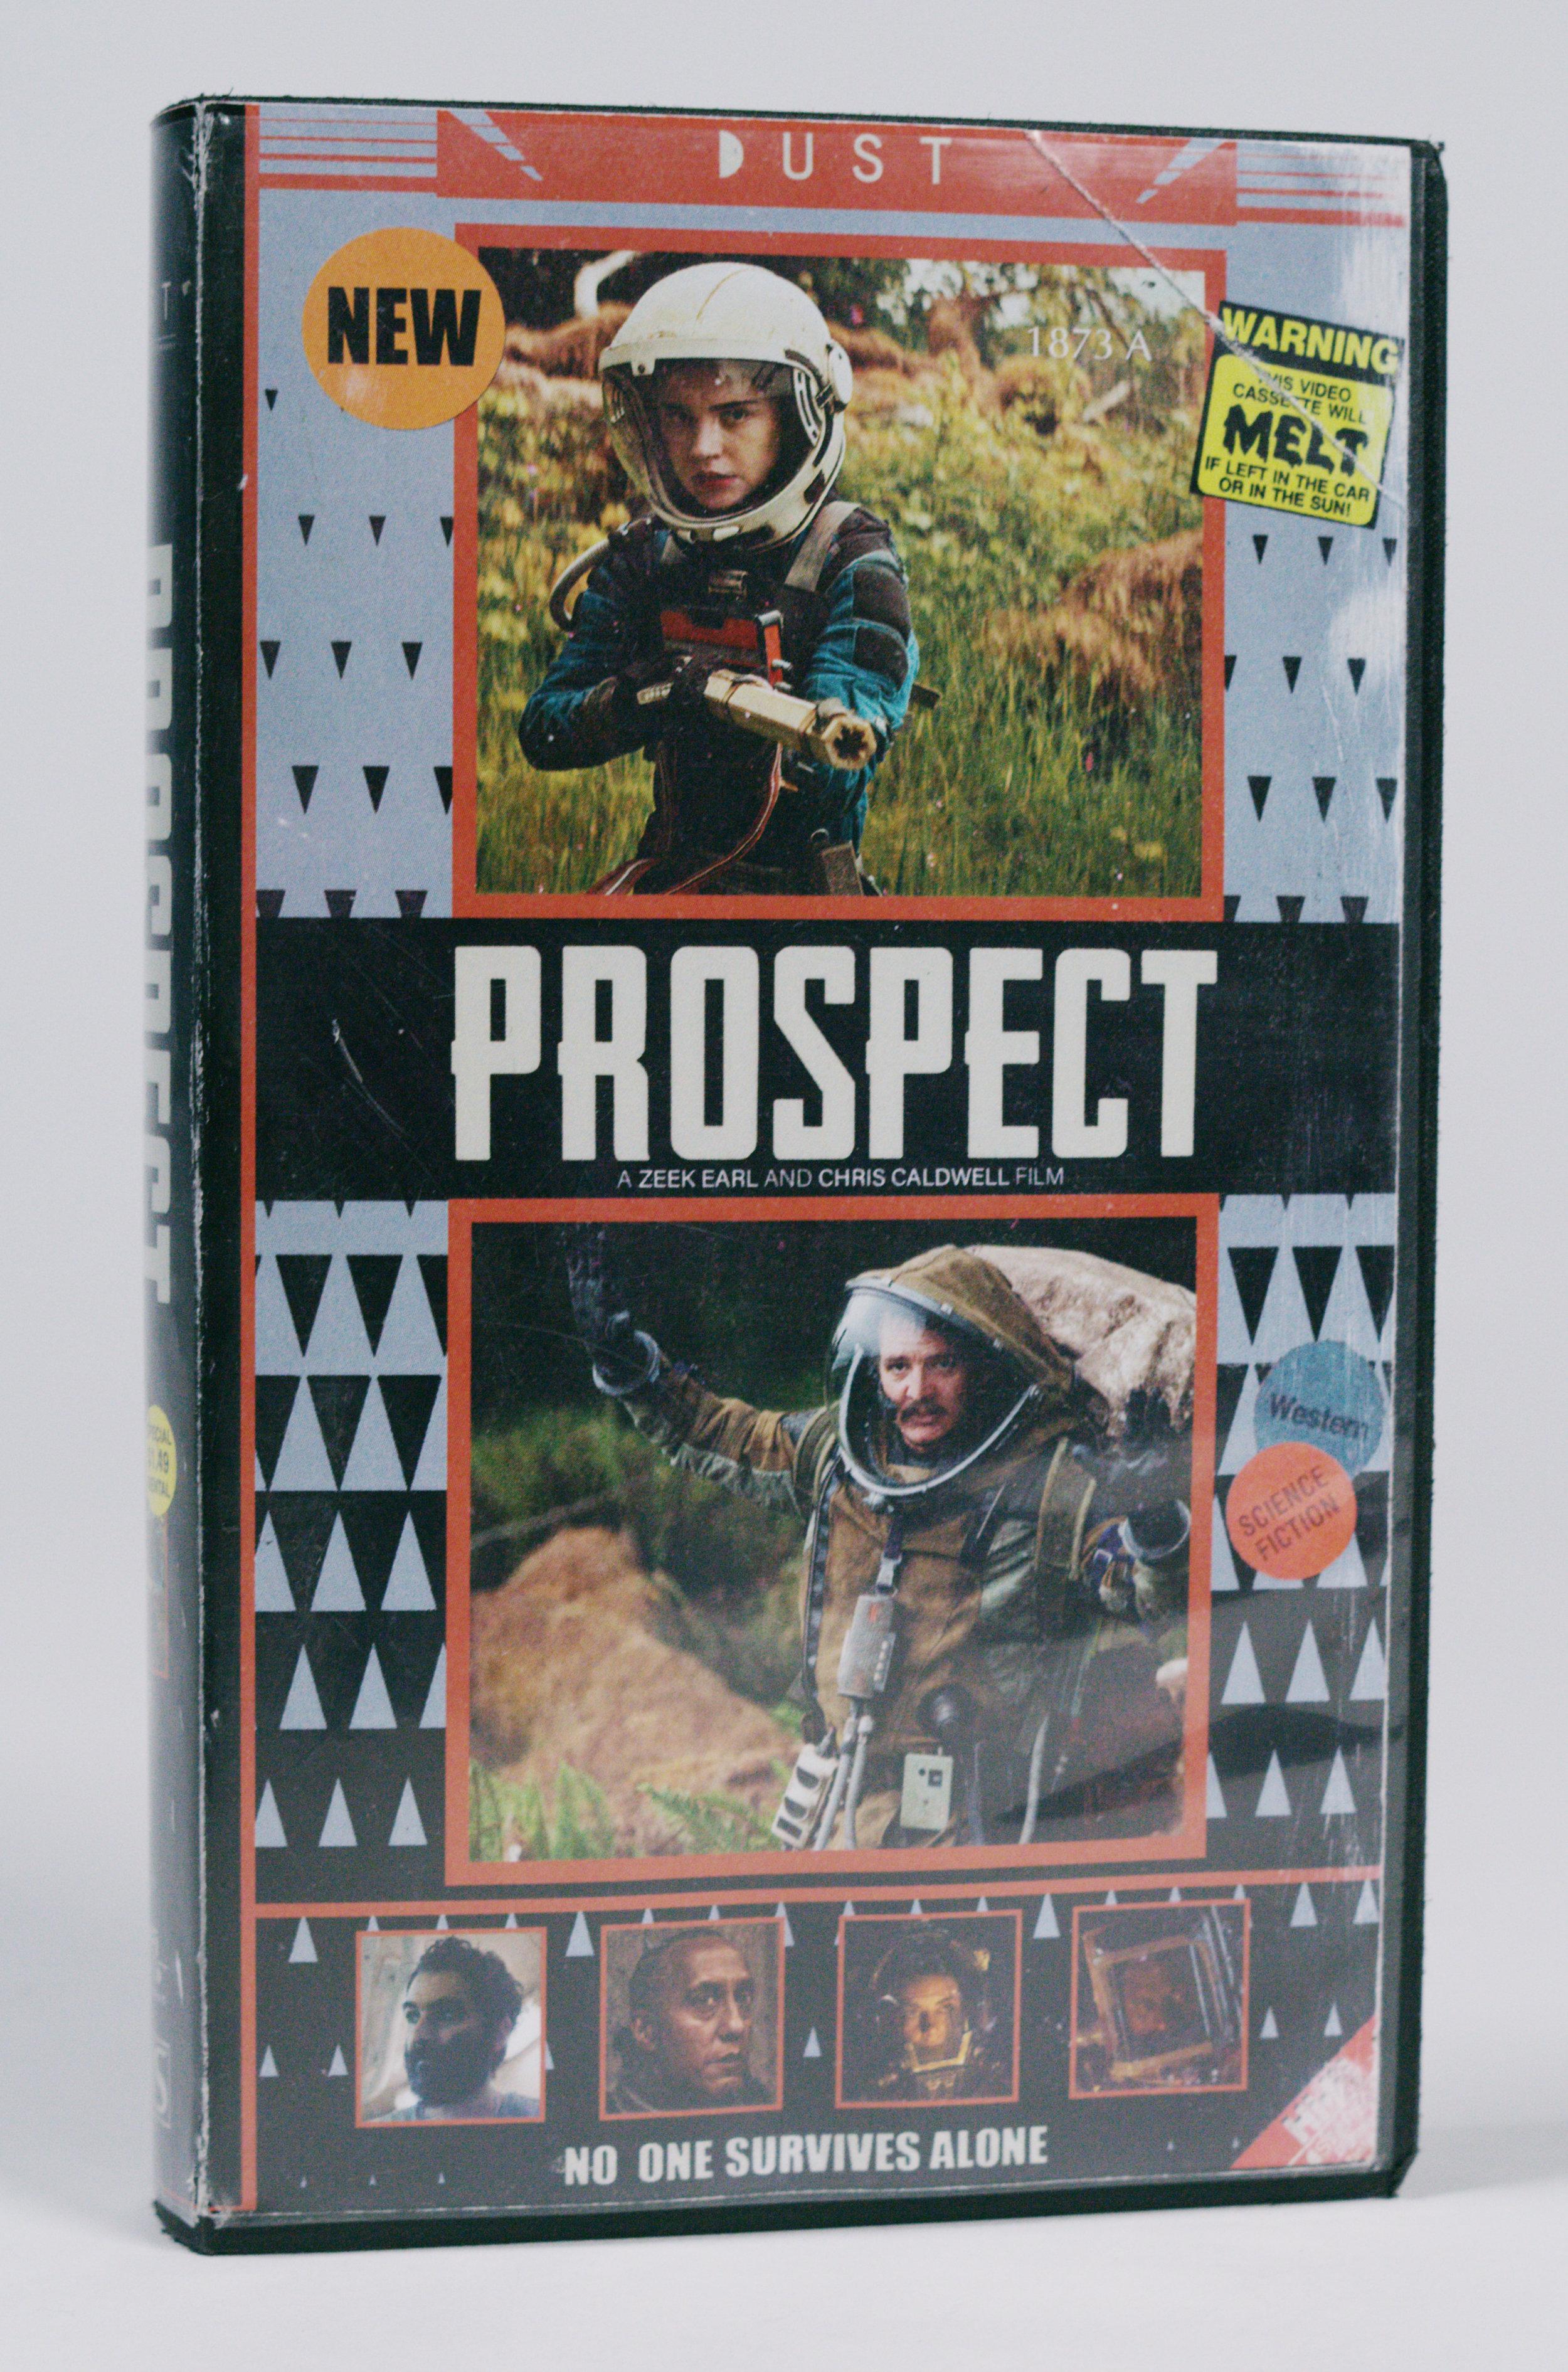 VHS 1.jpg